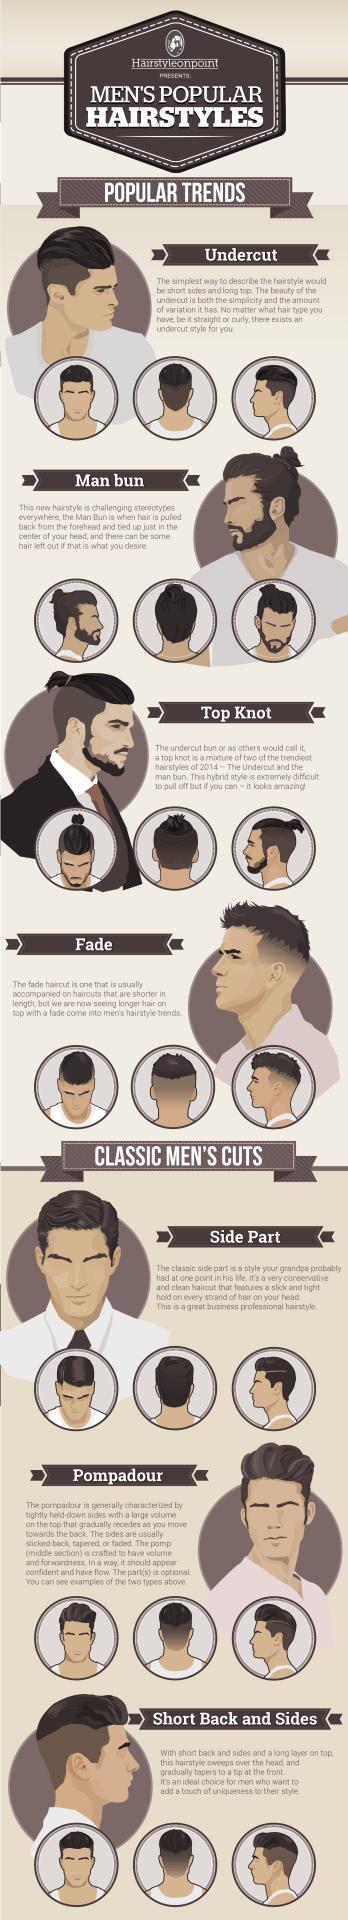 Men's Popular Hairstyles